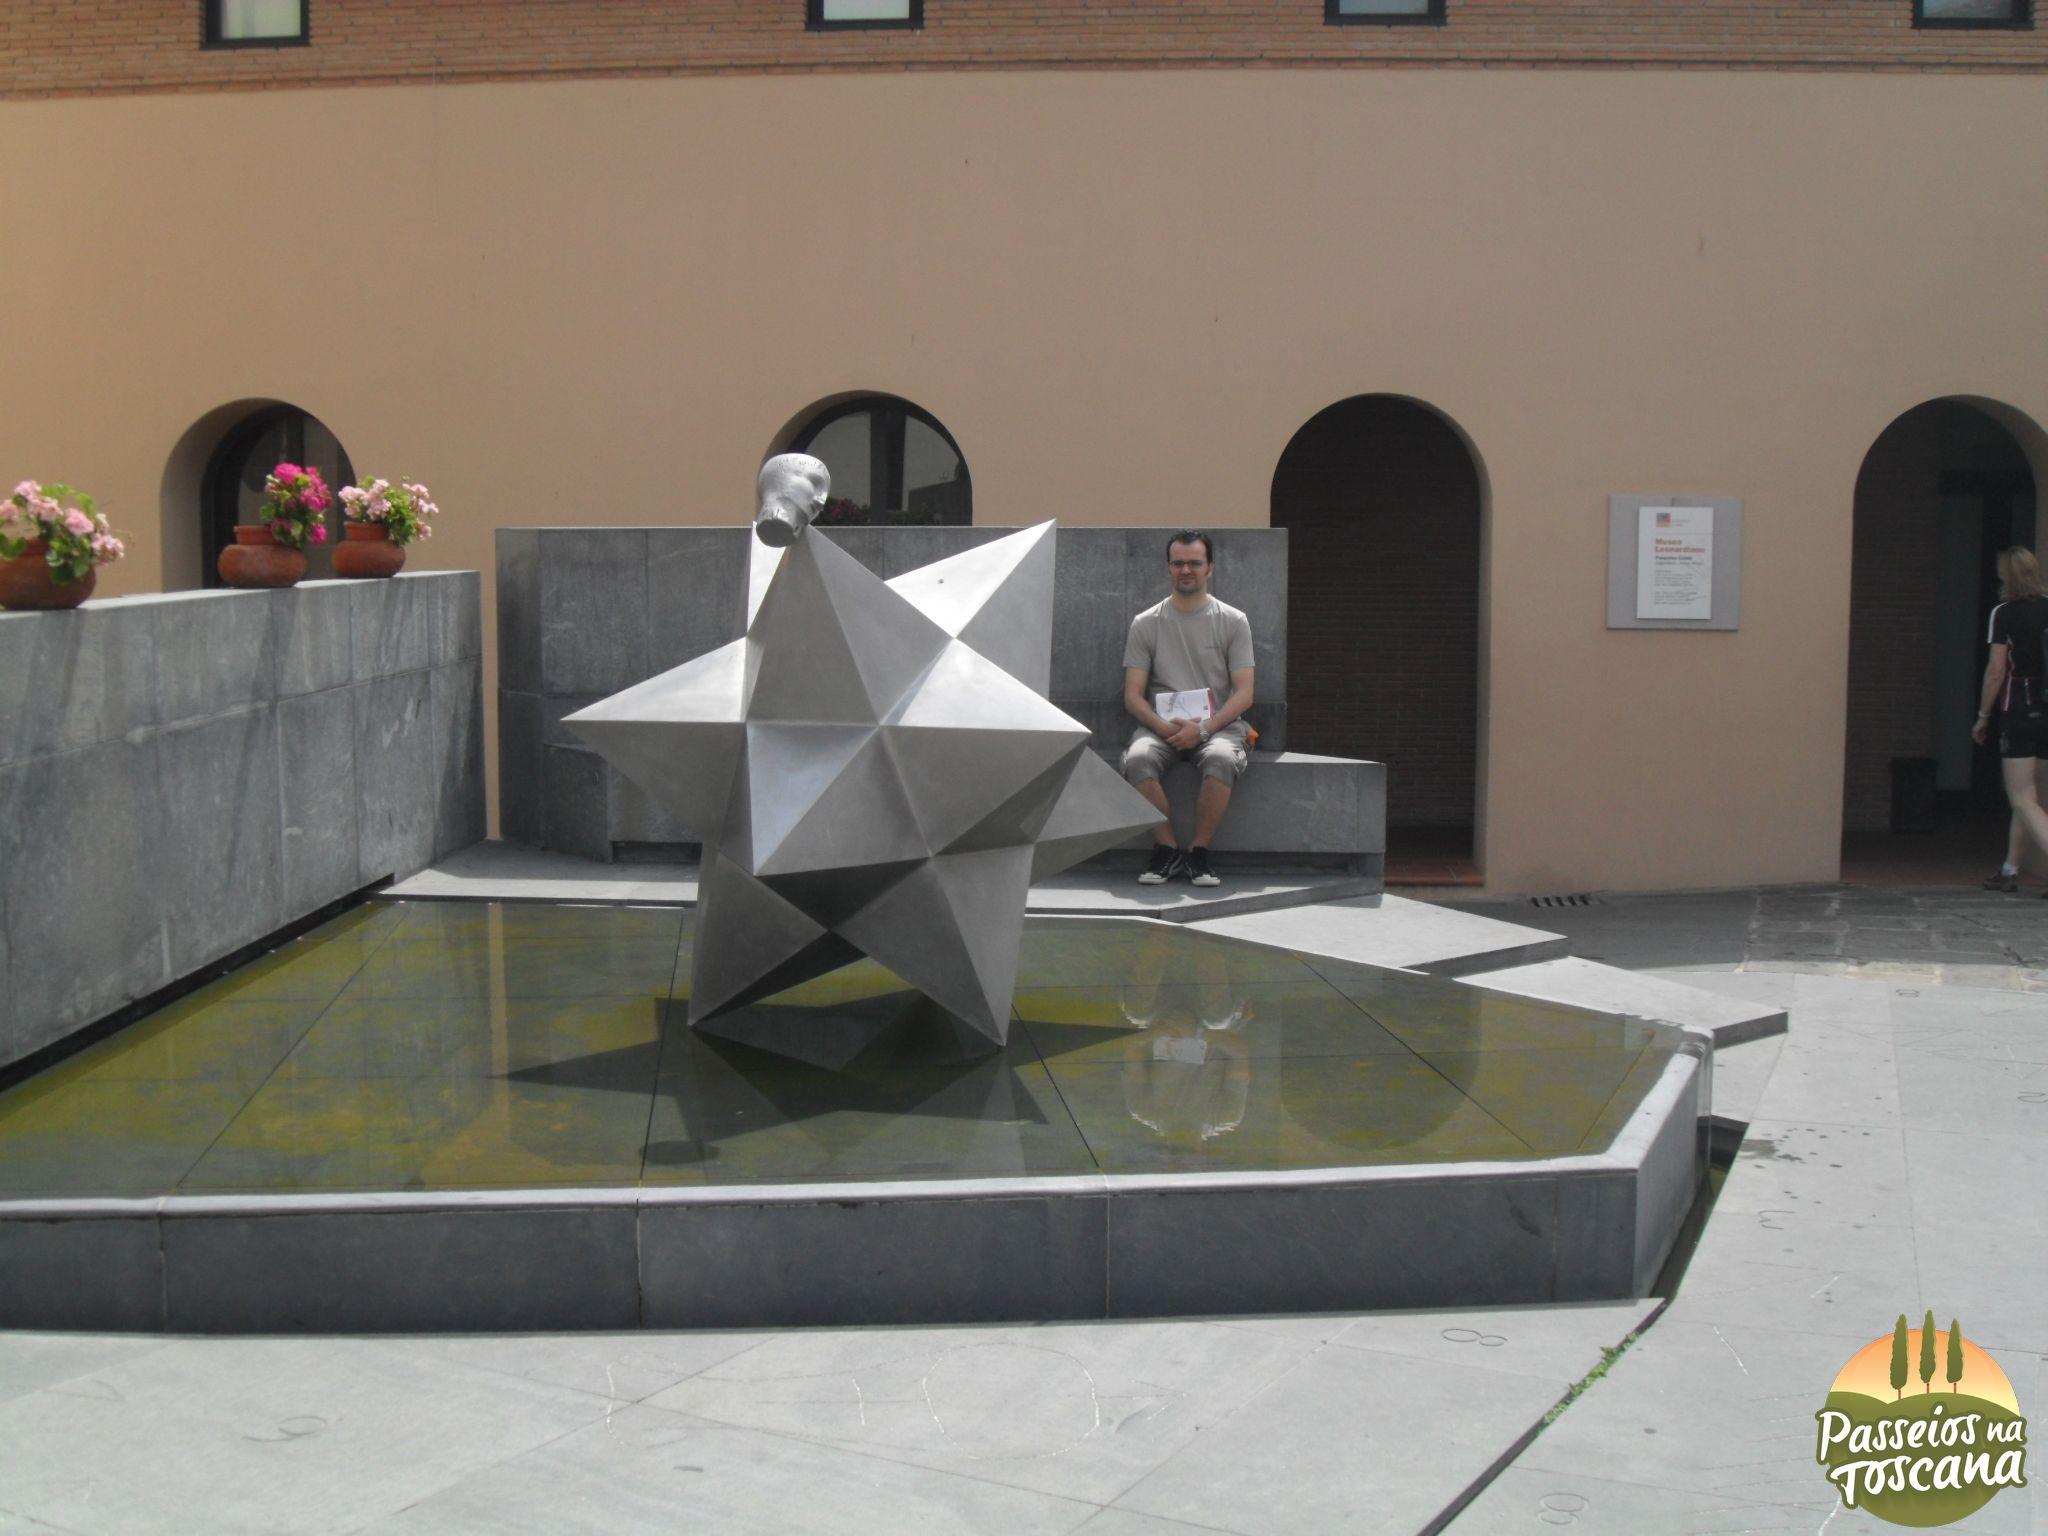 Piazza Guidi restaurada por Mimmo Paladino